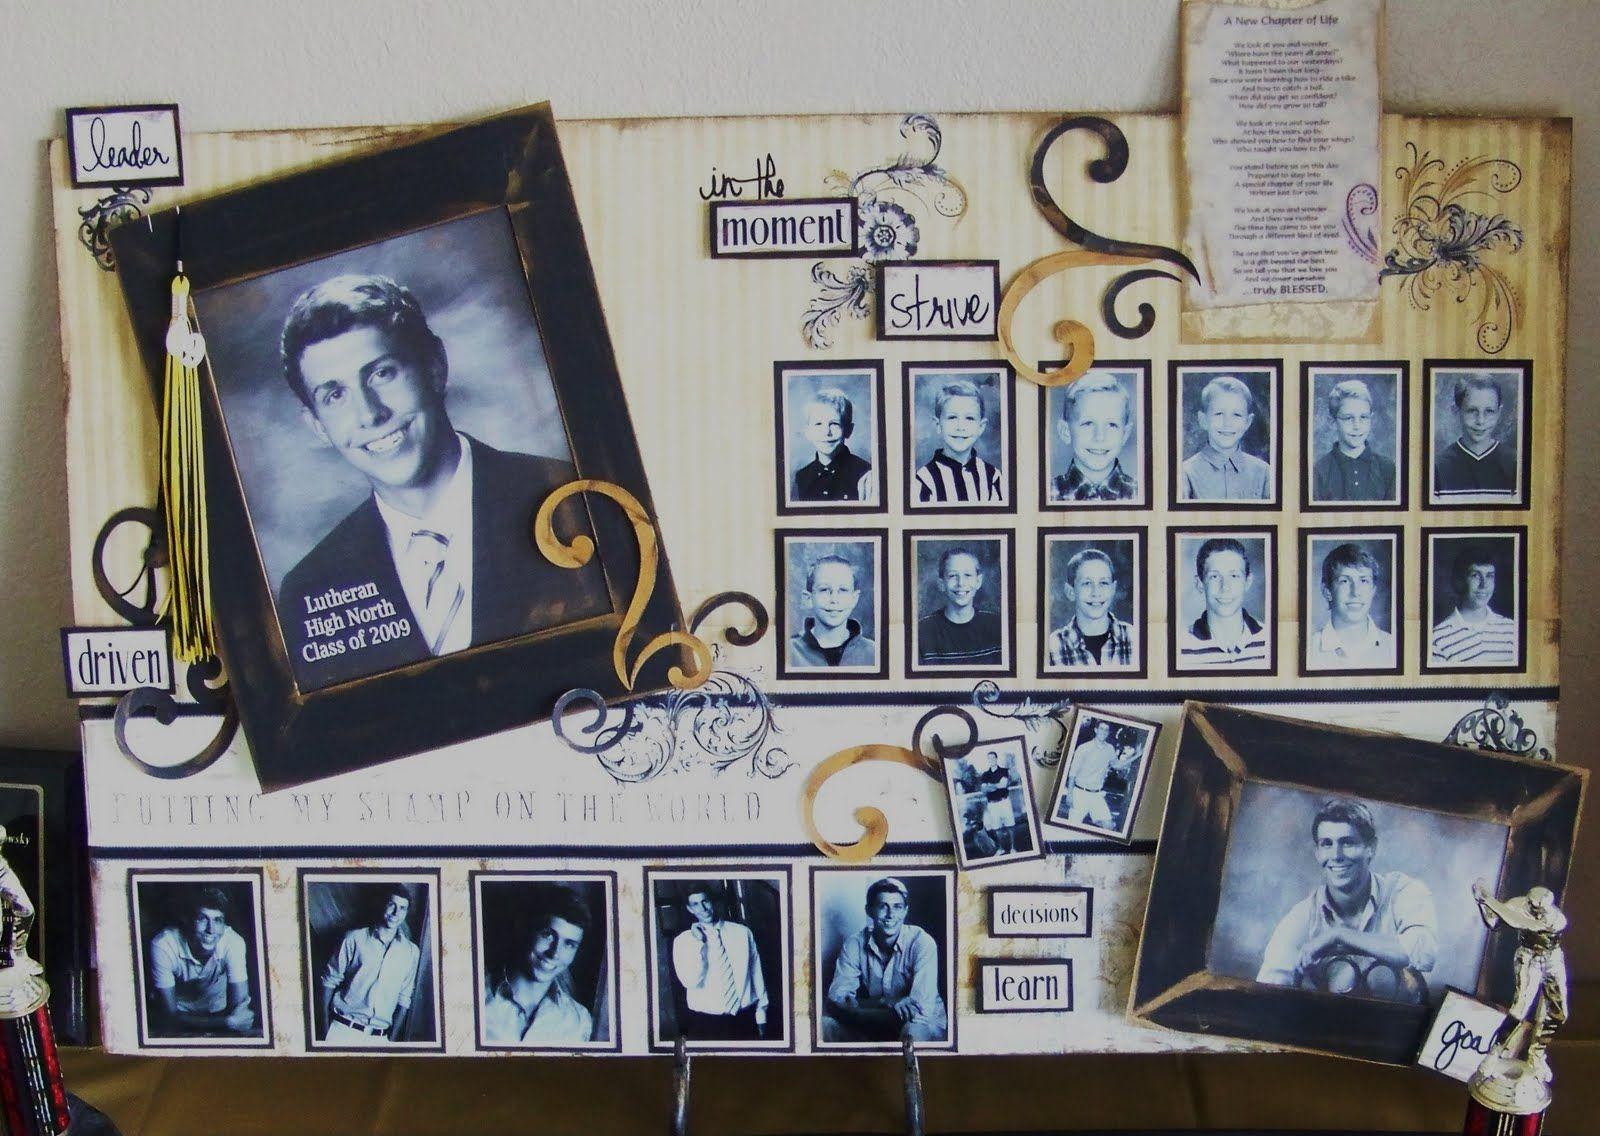 Scrapbook ideas graduation - Graduation Decoration Ideas Creations From My Heart A Graduation Memory Board To Treasure